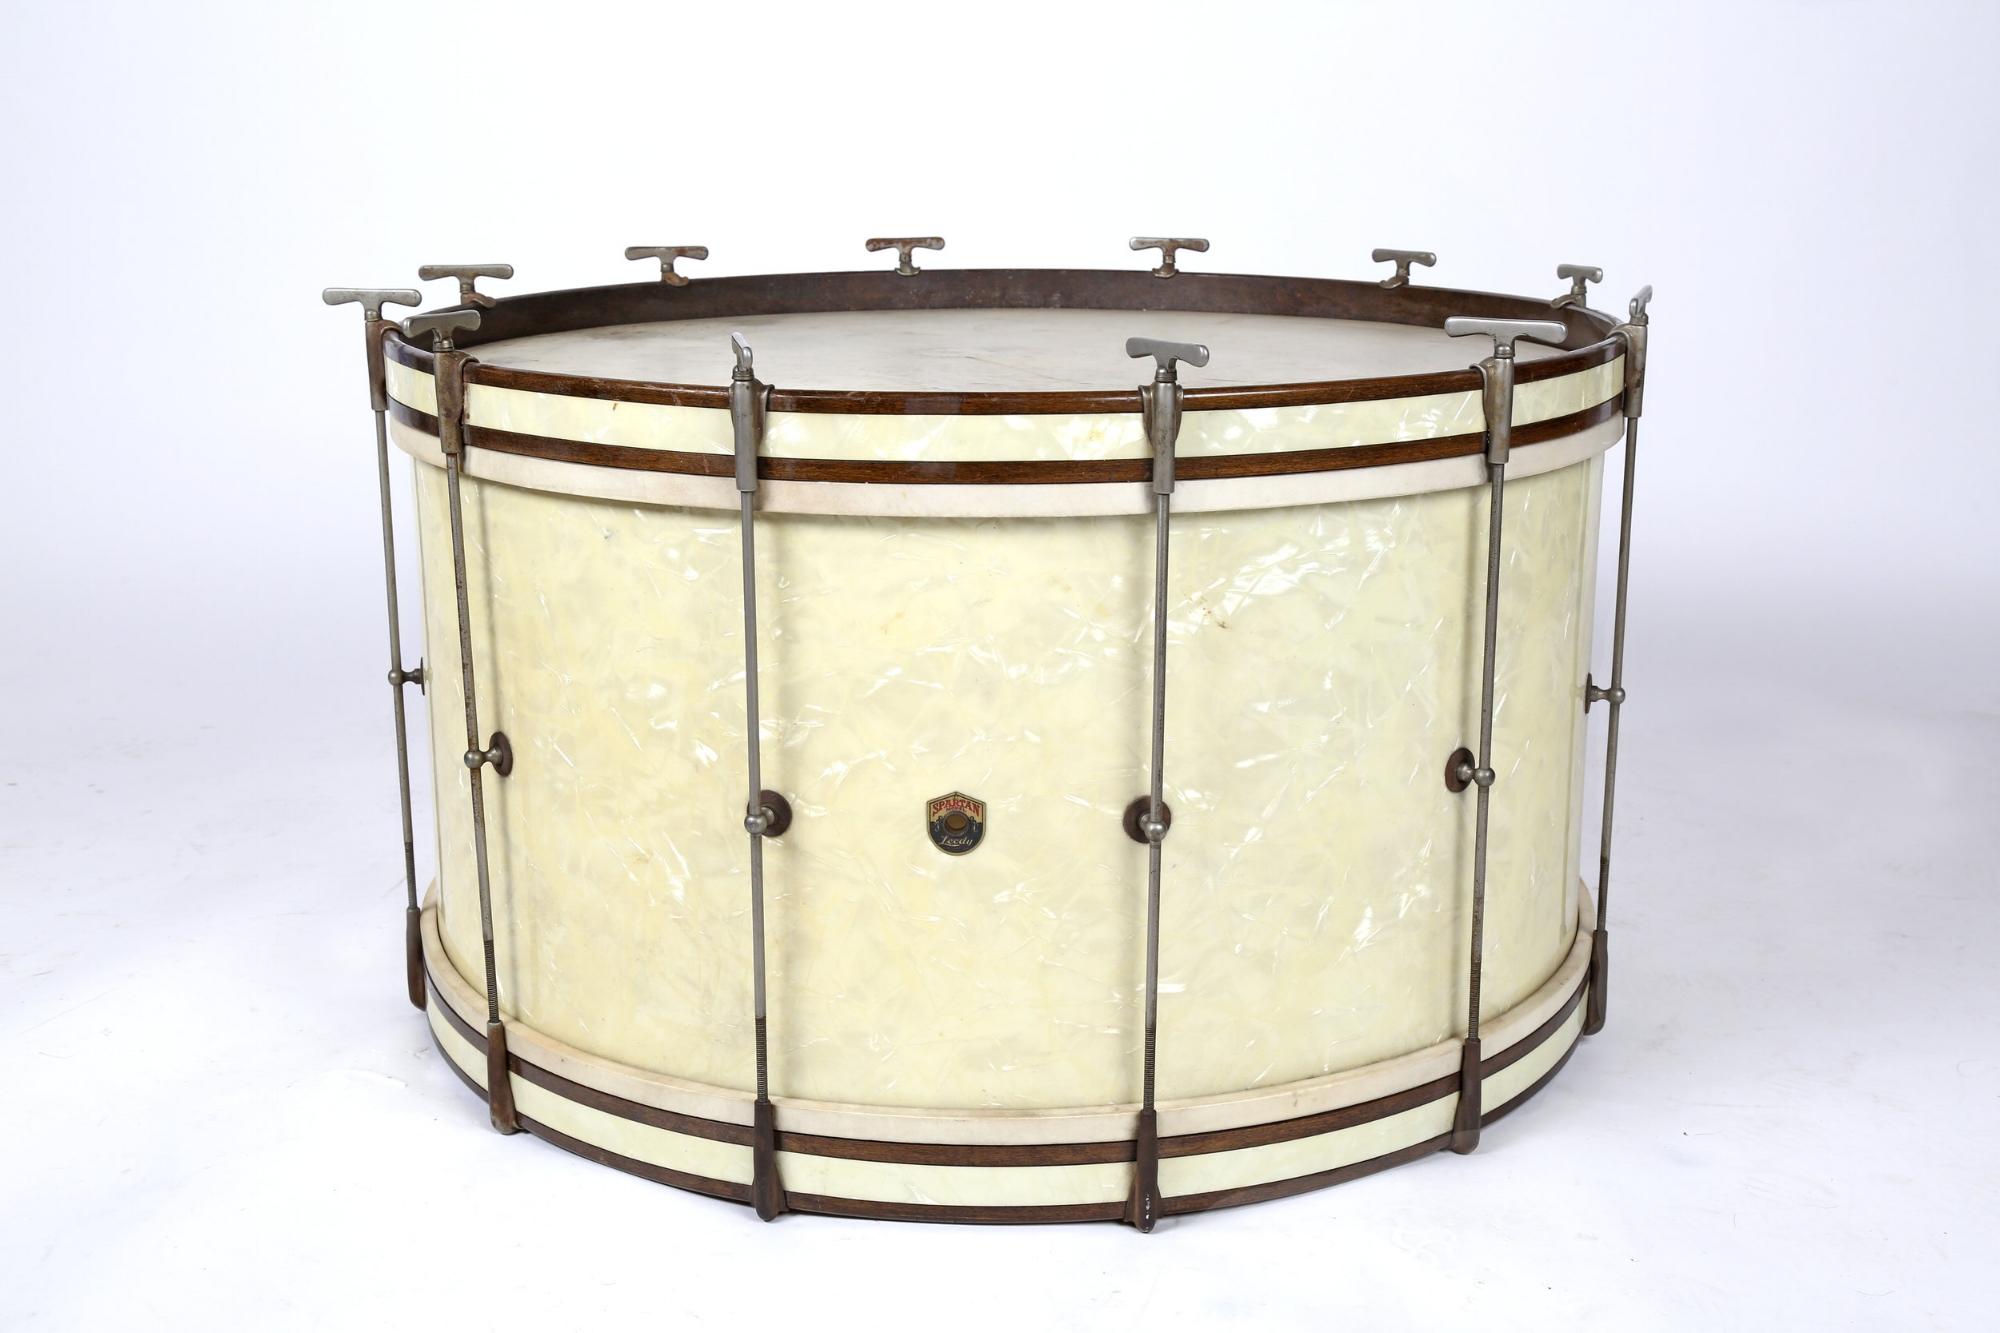 Dorio Vintage Drum_C&C Big Red_1991.jpg